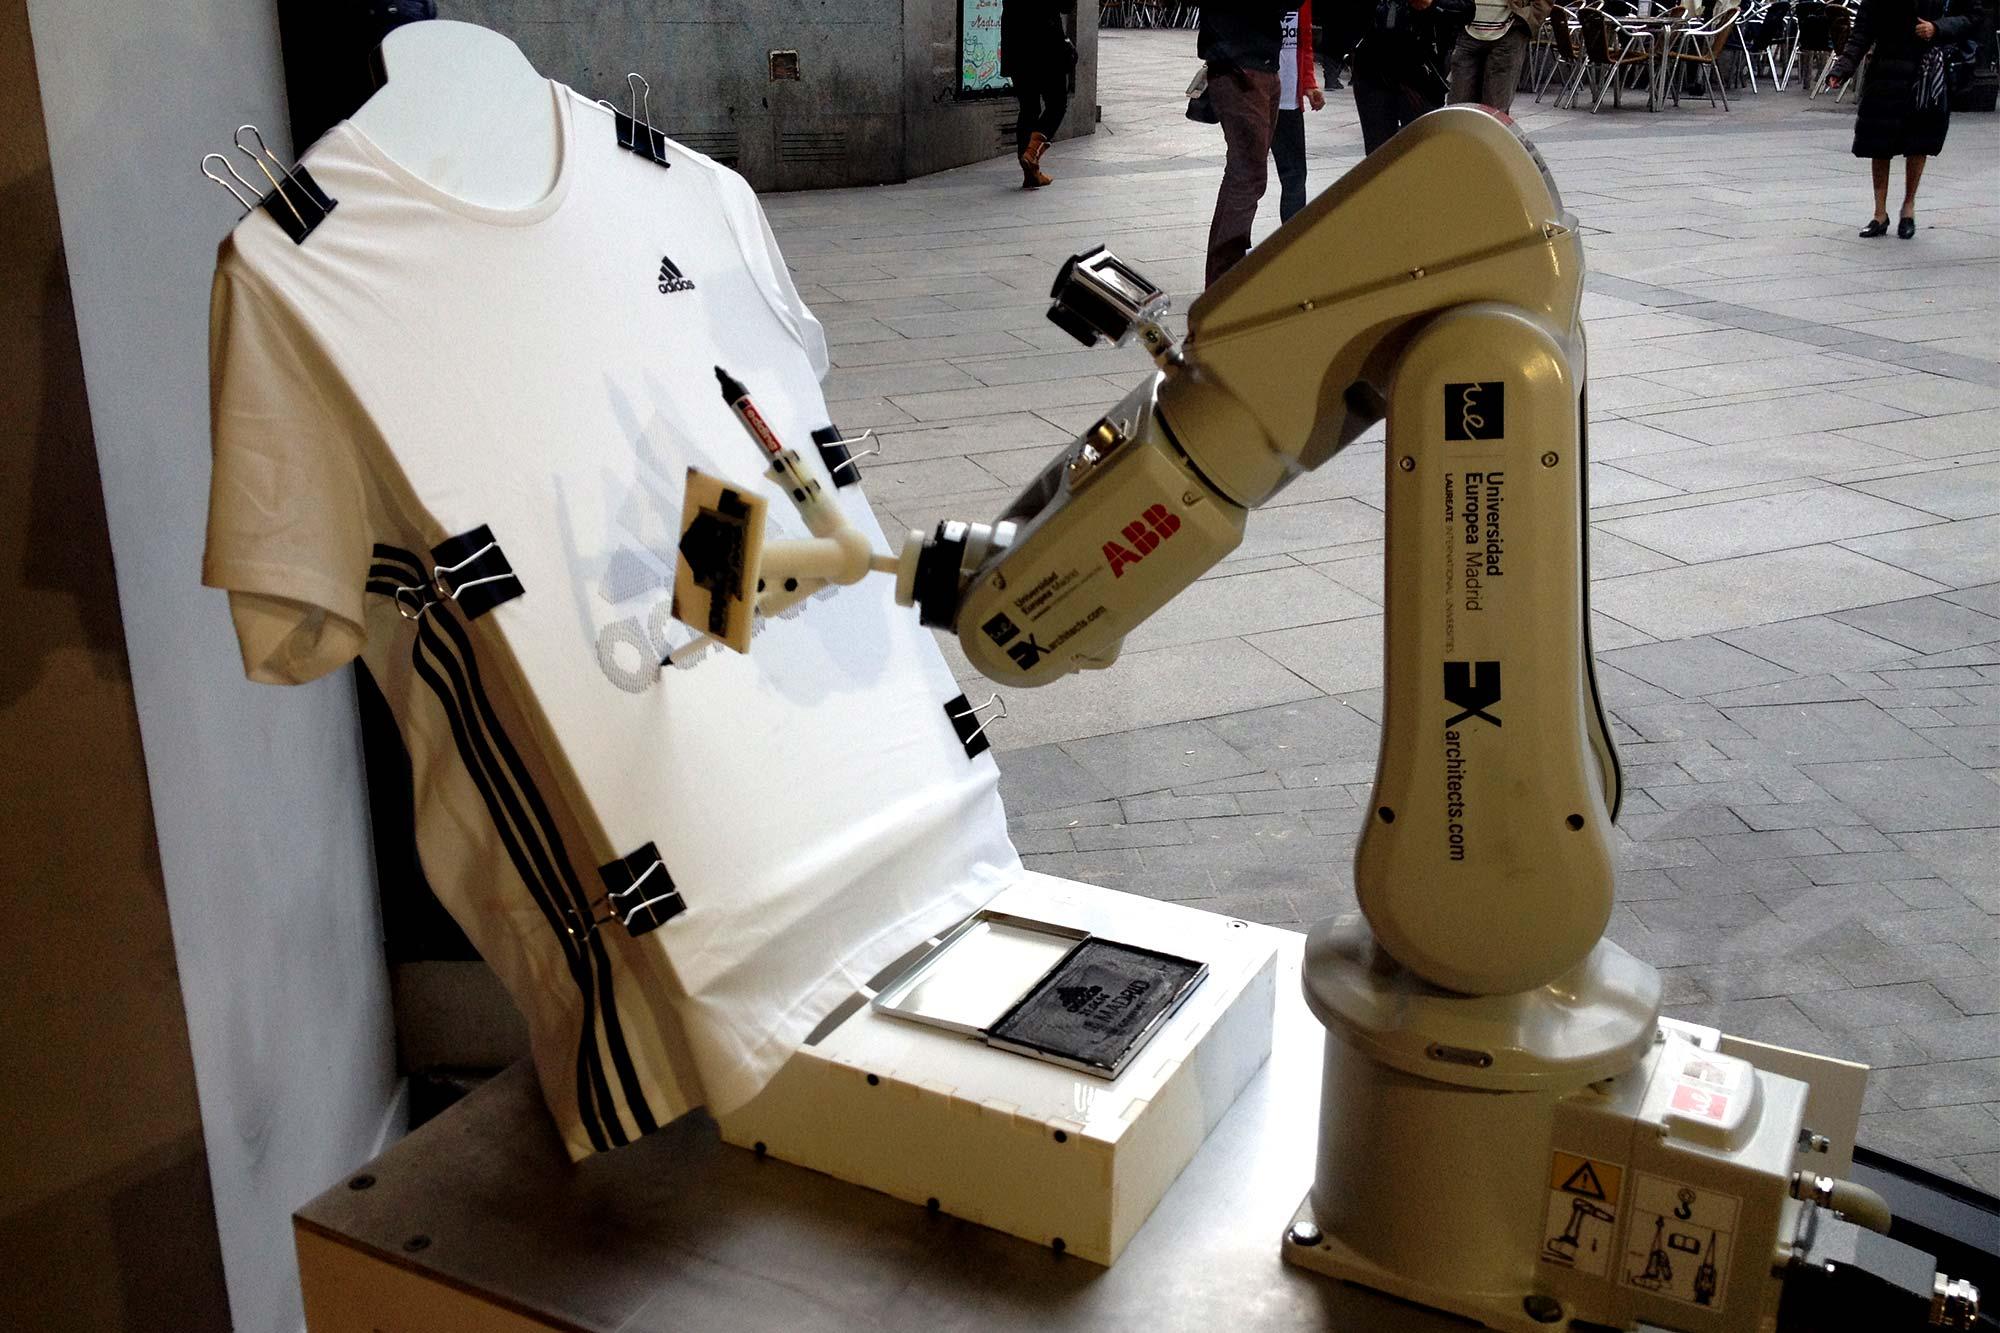 Retratos-Robots_-A_-techlab-_-EXarchitects_10